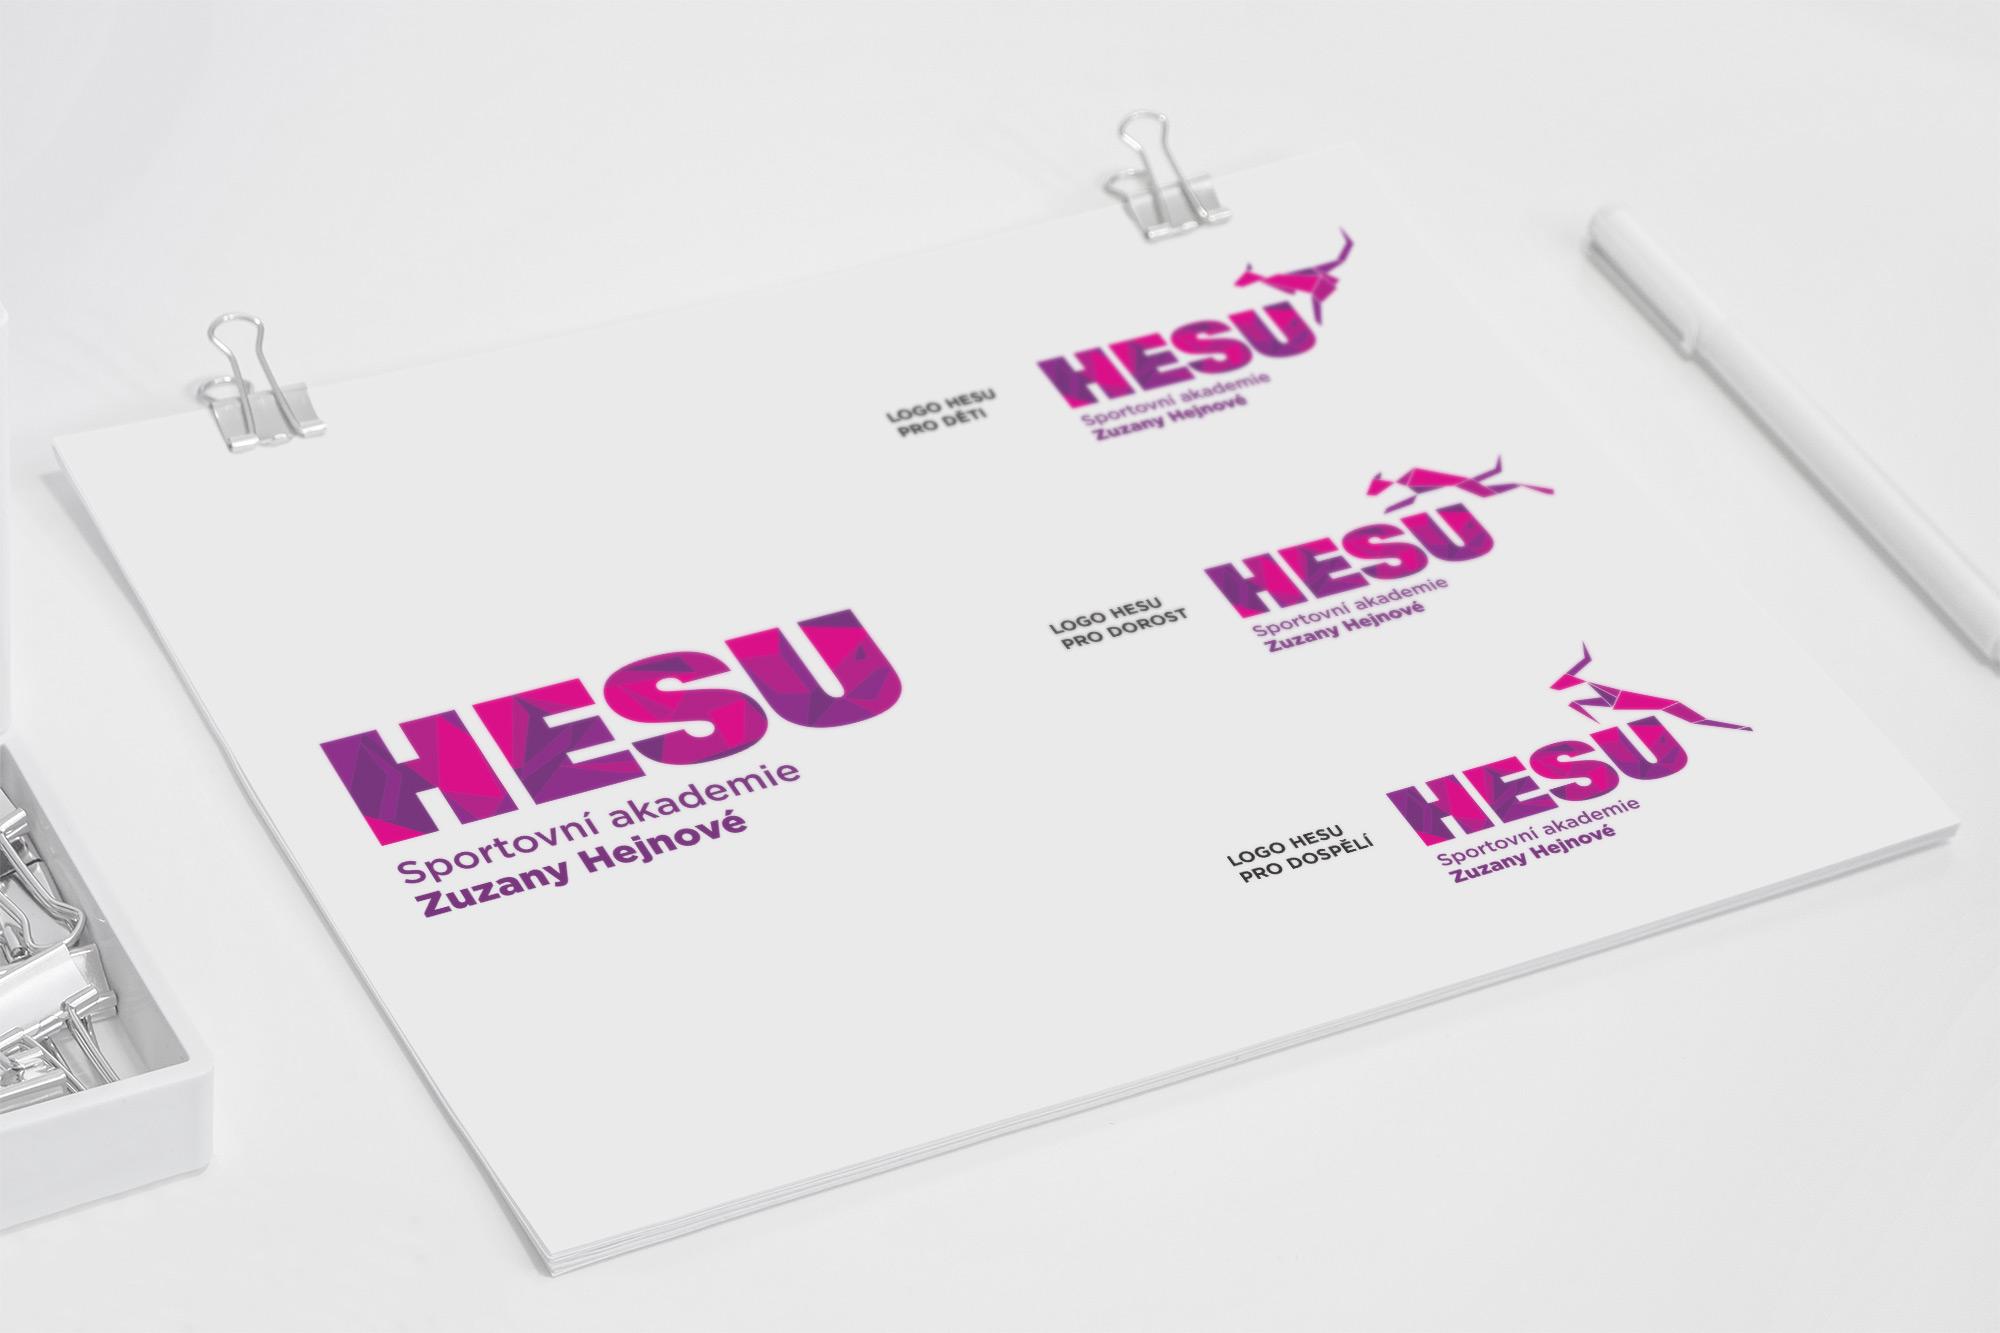 DA - Web - Pripadovky - HESU 03 - Mockup 01